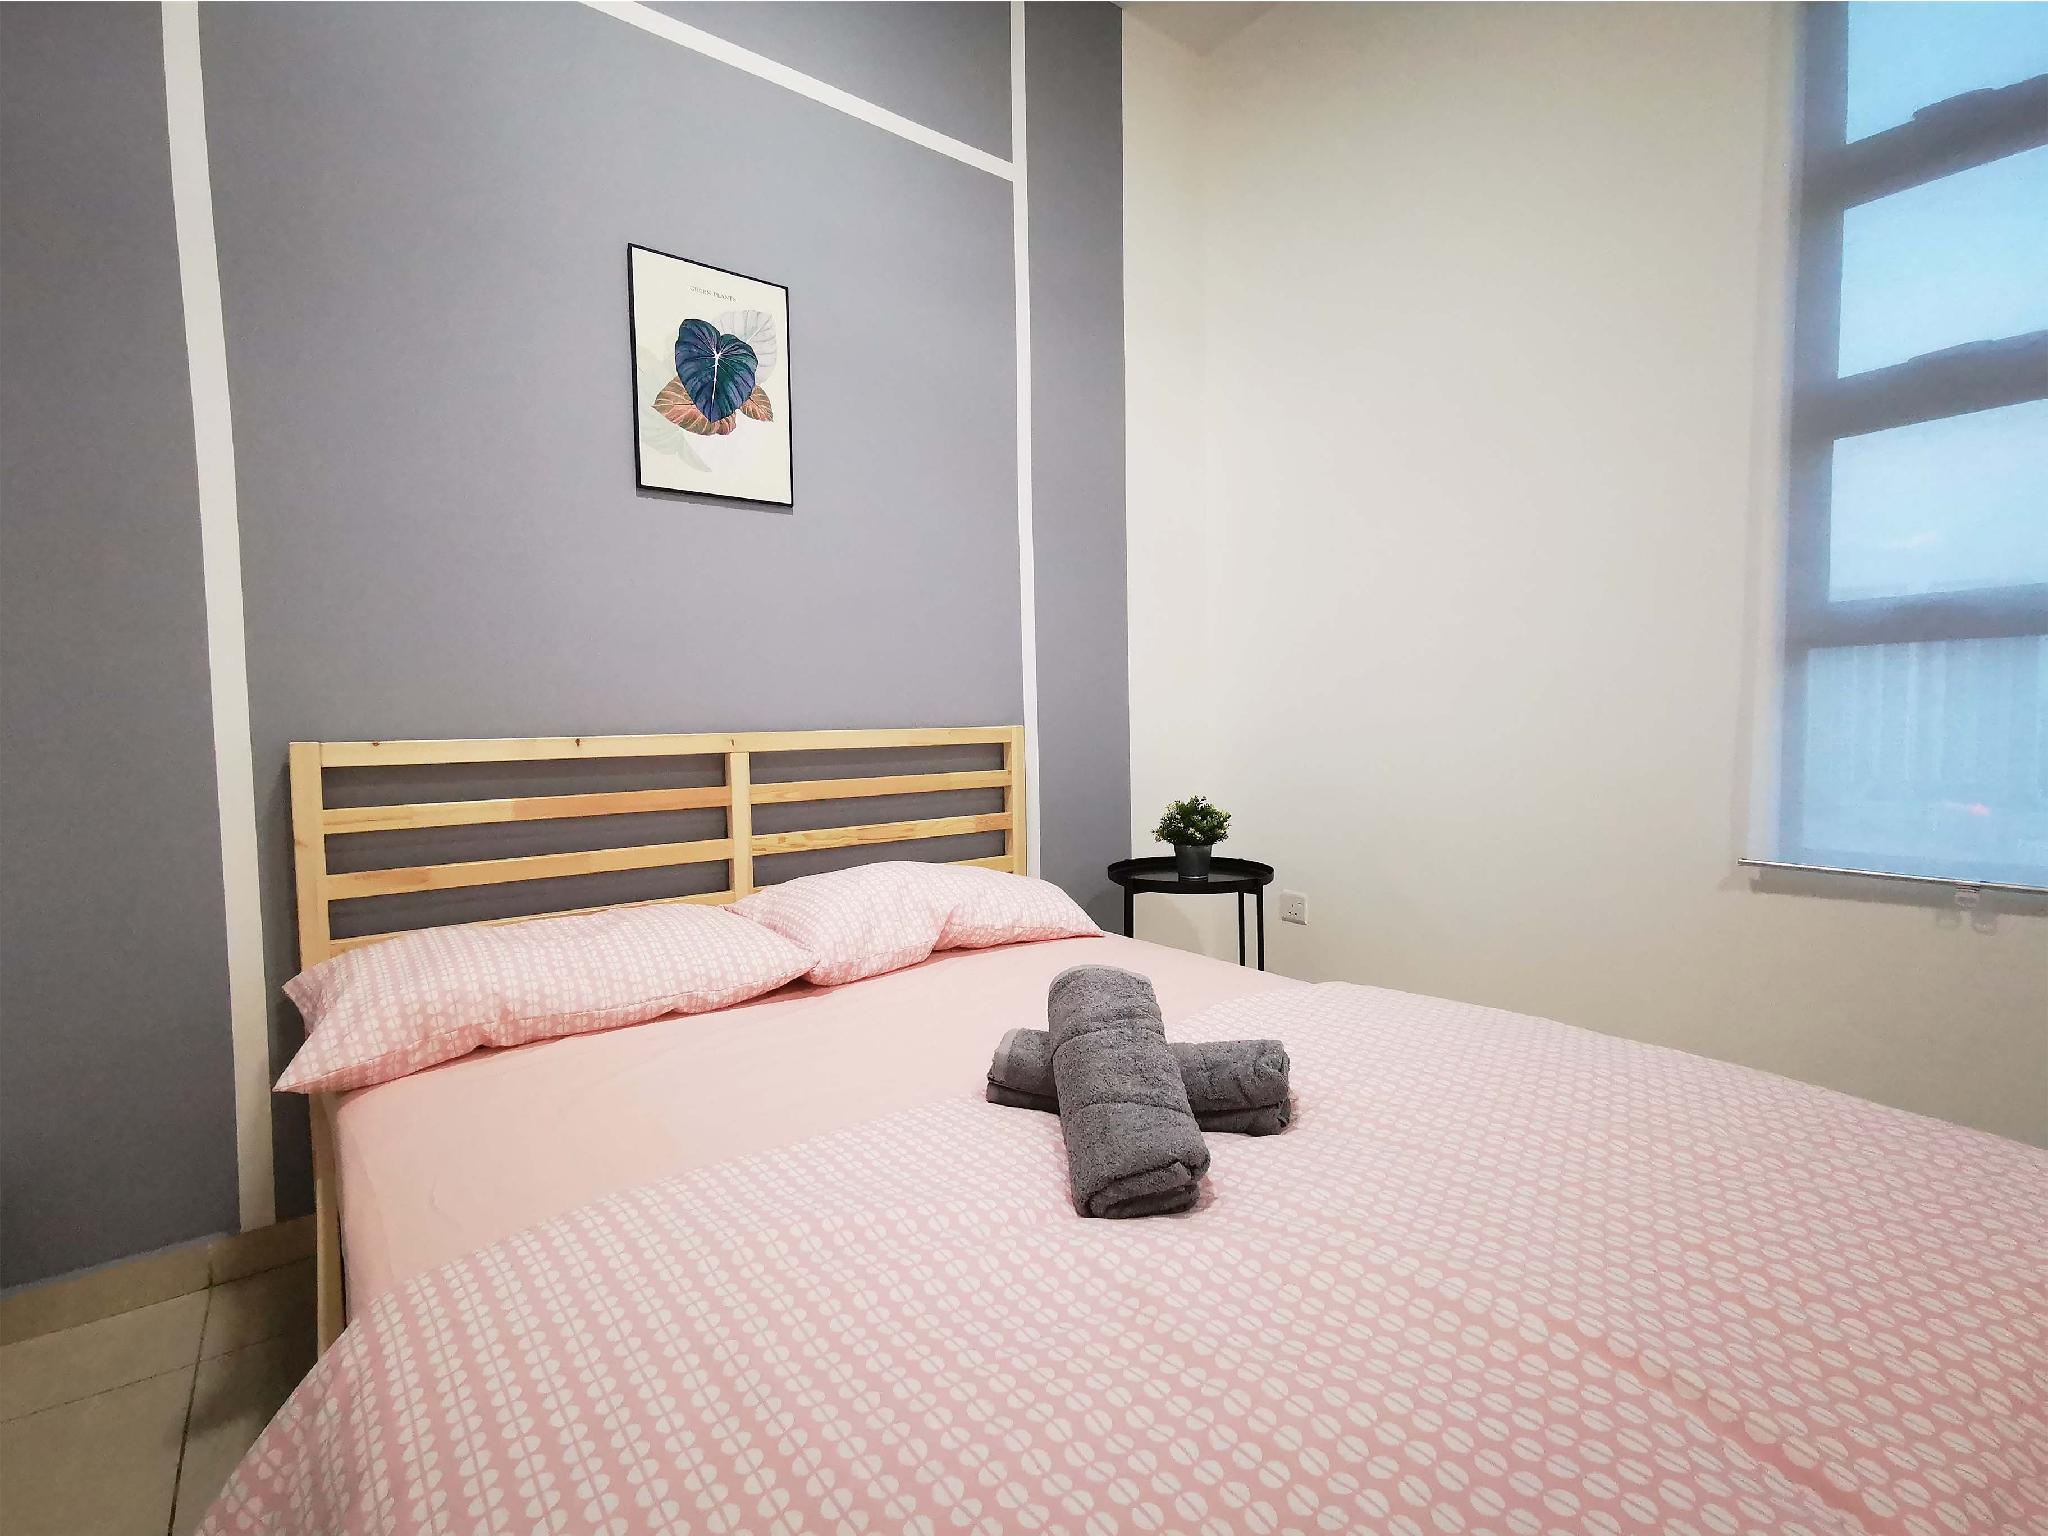 Desire Room At Bukit Indah * Aeon Mall * 1709 R1